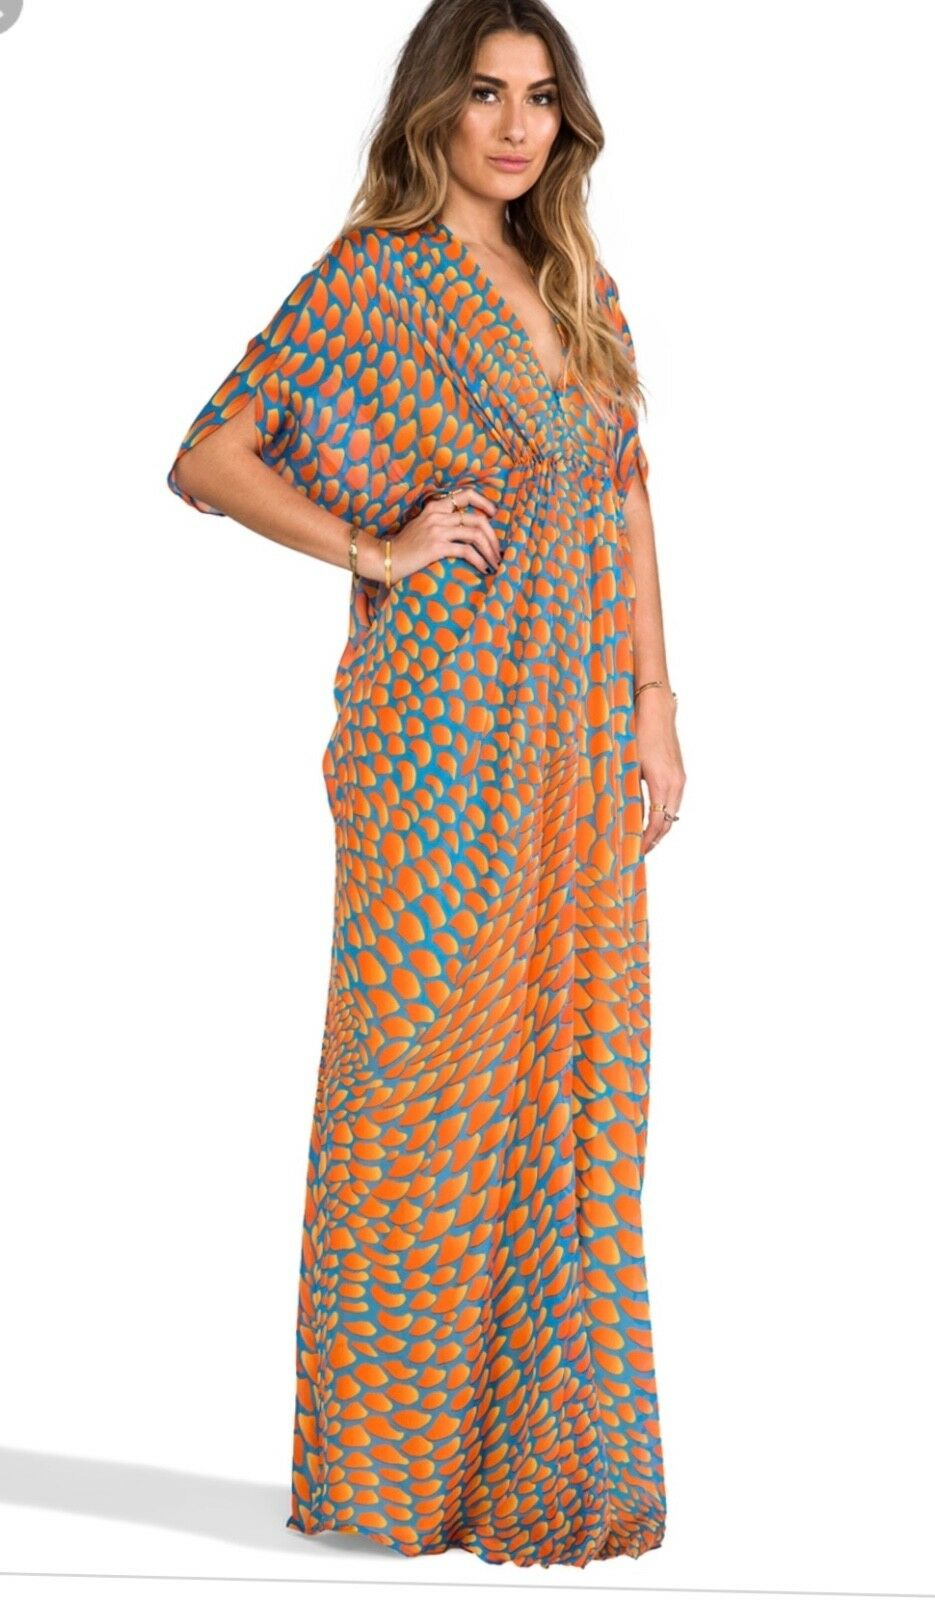 ISSA ISSA ISSA LONDON orange MAXI DRESS SIZE US10 UK14 f85894